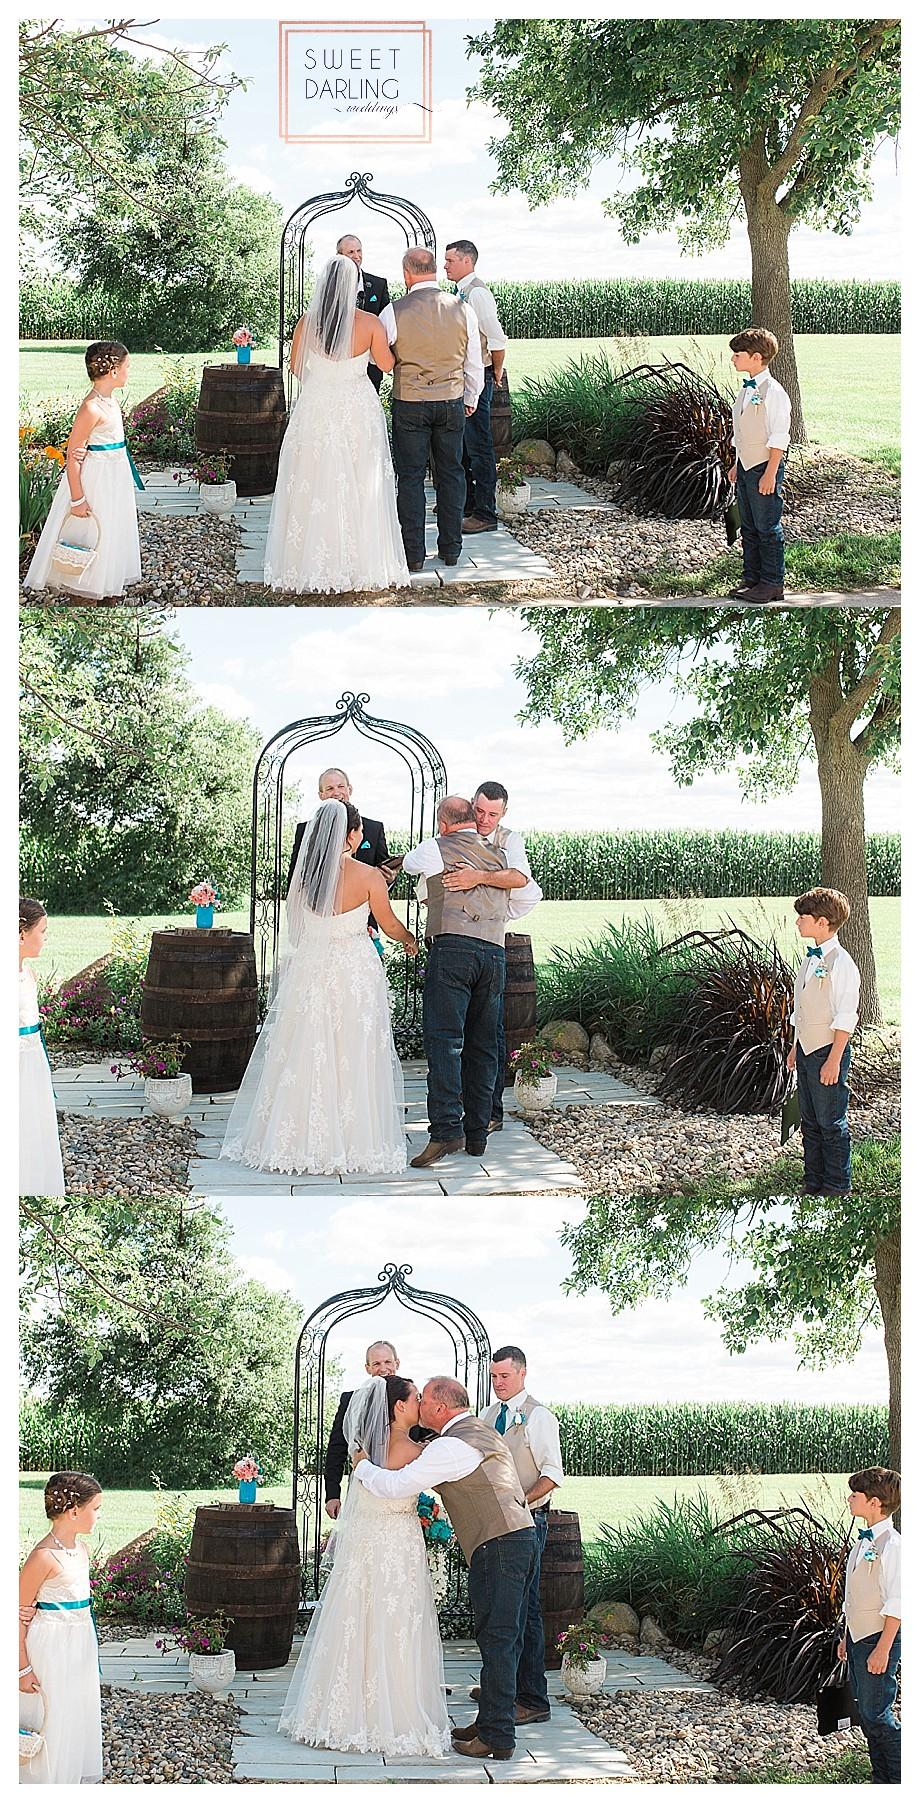 wedding-barn-farm-horses-sparkler-exit-Engelbrecht-Farm-Paxton-Illinois-Sweet-Darling-Weddings-Photographer_0471